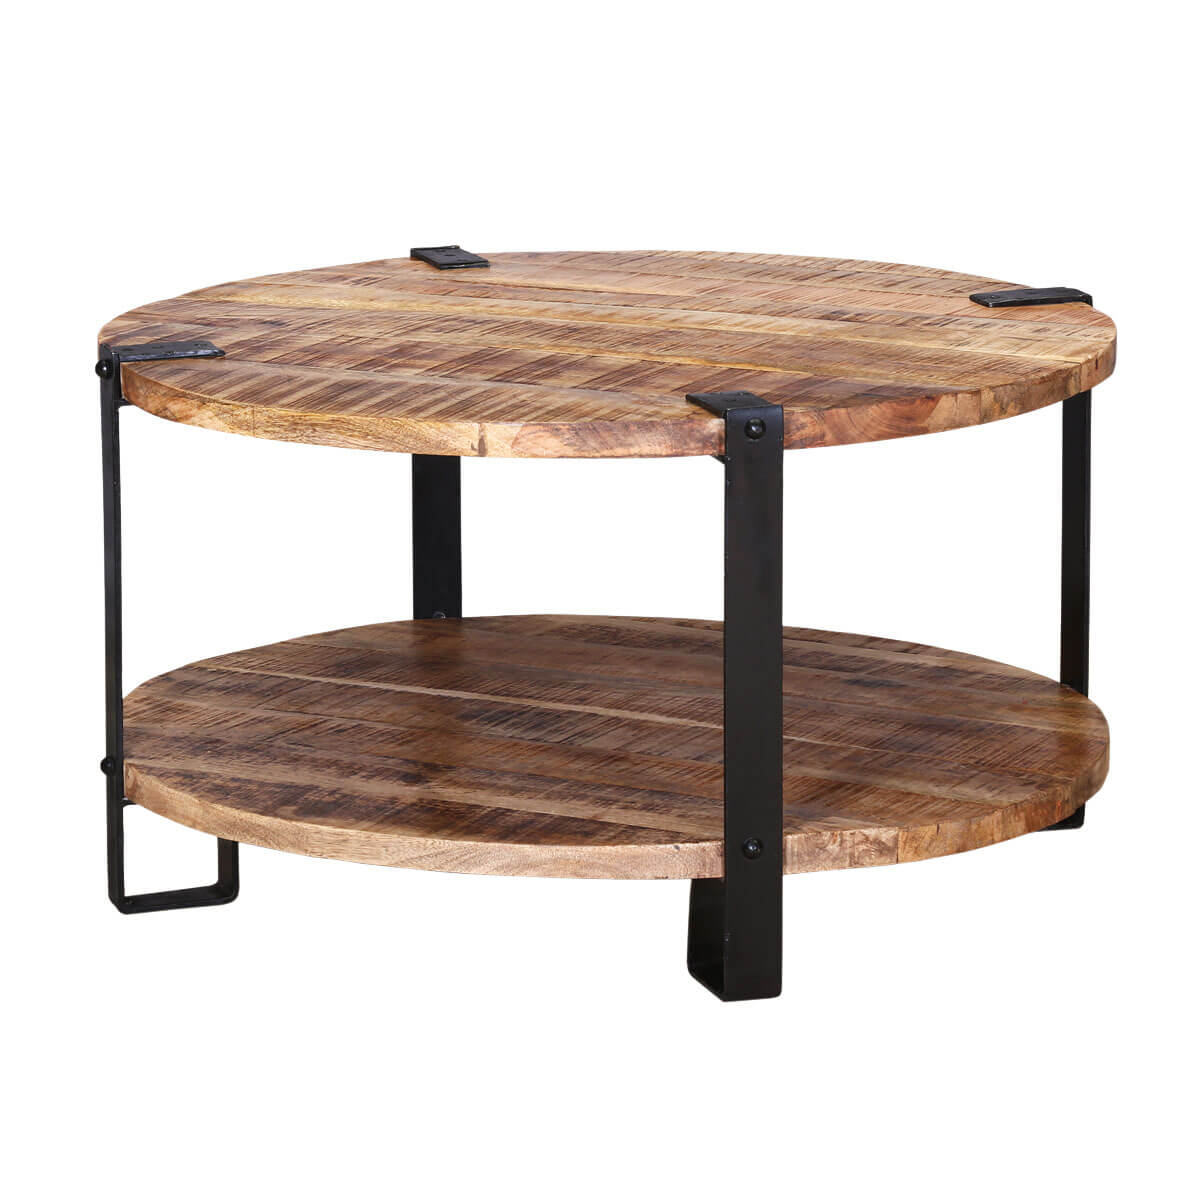 "35"" Rustic Industrial Round Barn Coffee Table. Plain Black Desk. Hon Desk Assembly Instructions. Cbp Help Desk Phone Number. 2 Drawer Locking File Cabinet. Fashion Desk Accessories. Shaker Lap Desk. Travel Lap Desk. Clear Office Desk"